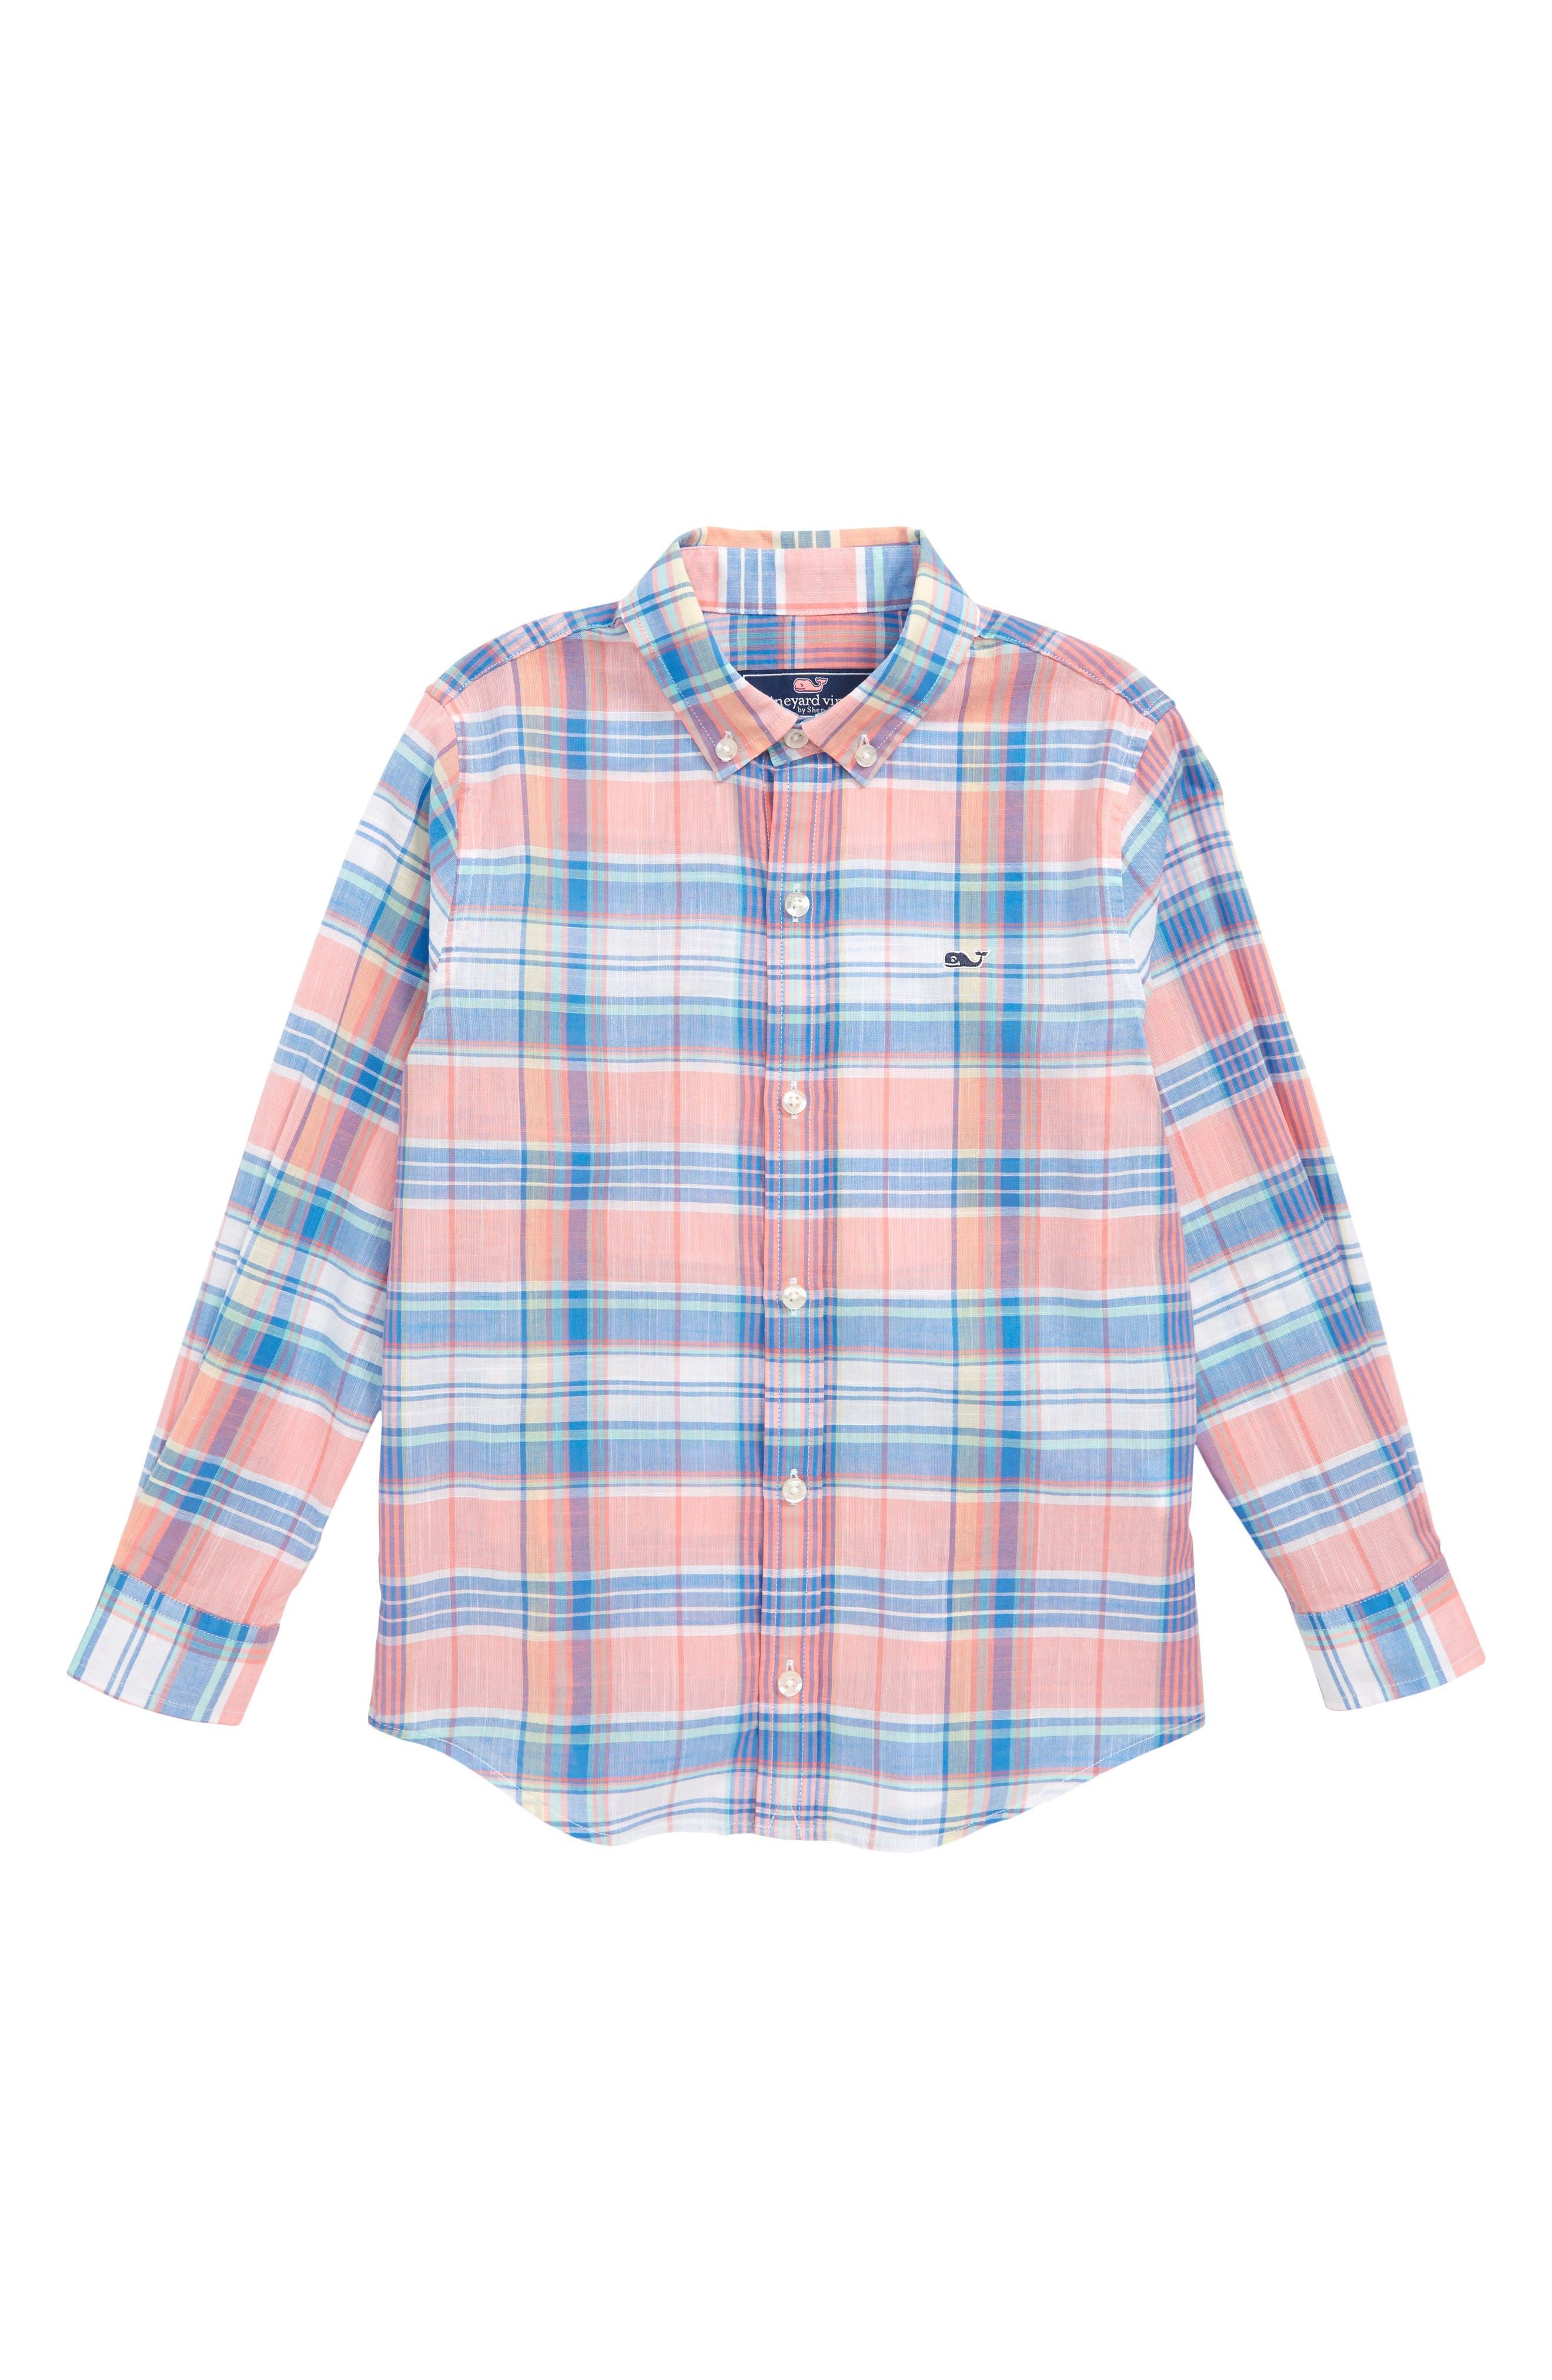 Smith Point Plaid Whale Shirt,                             Main thumbnail 1, color,                             681